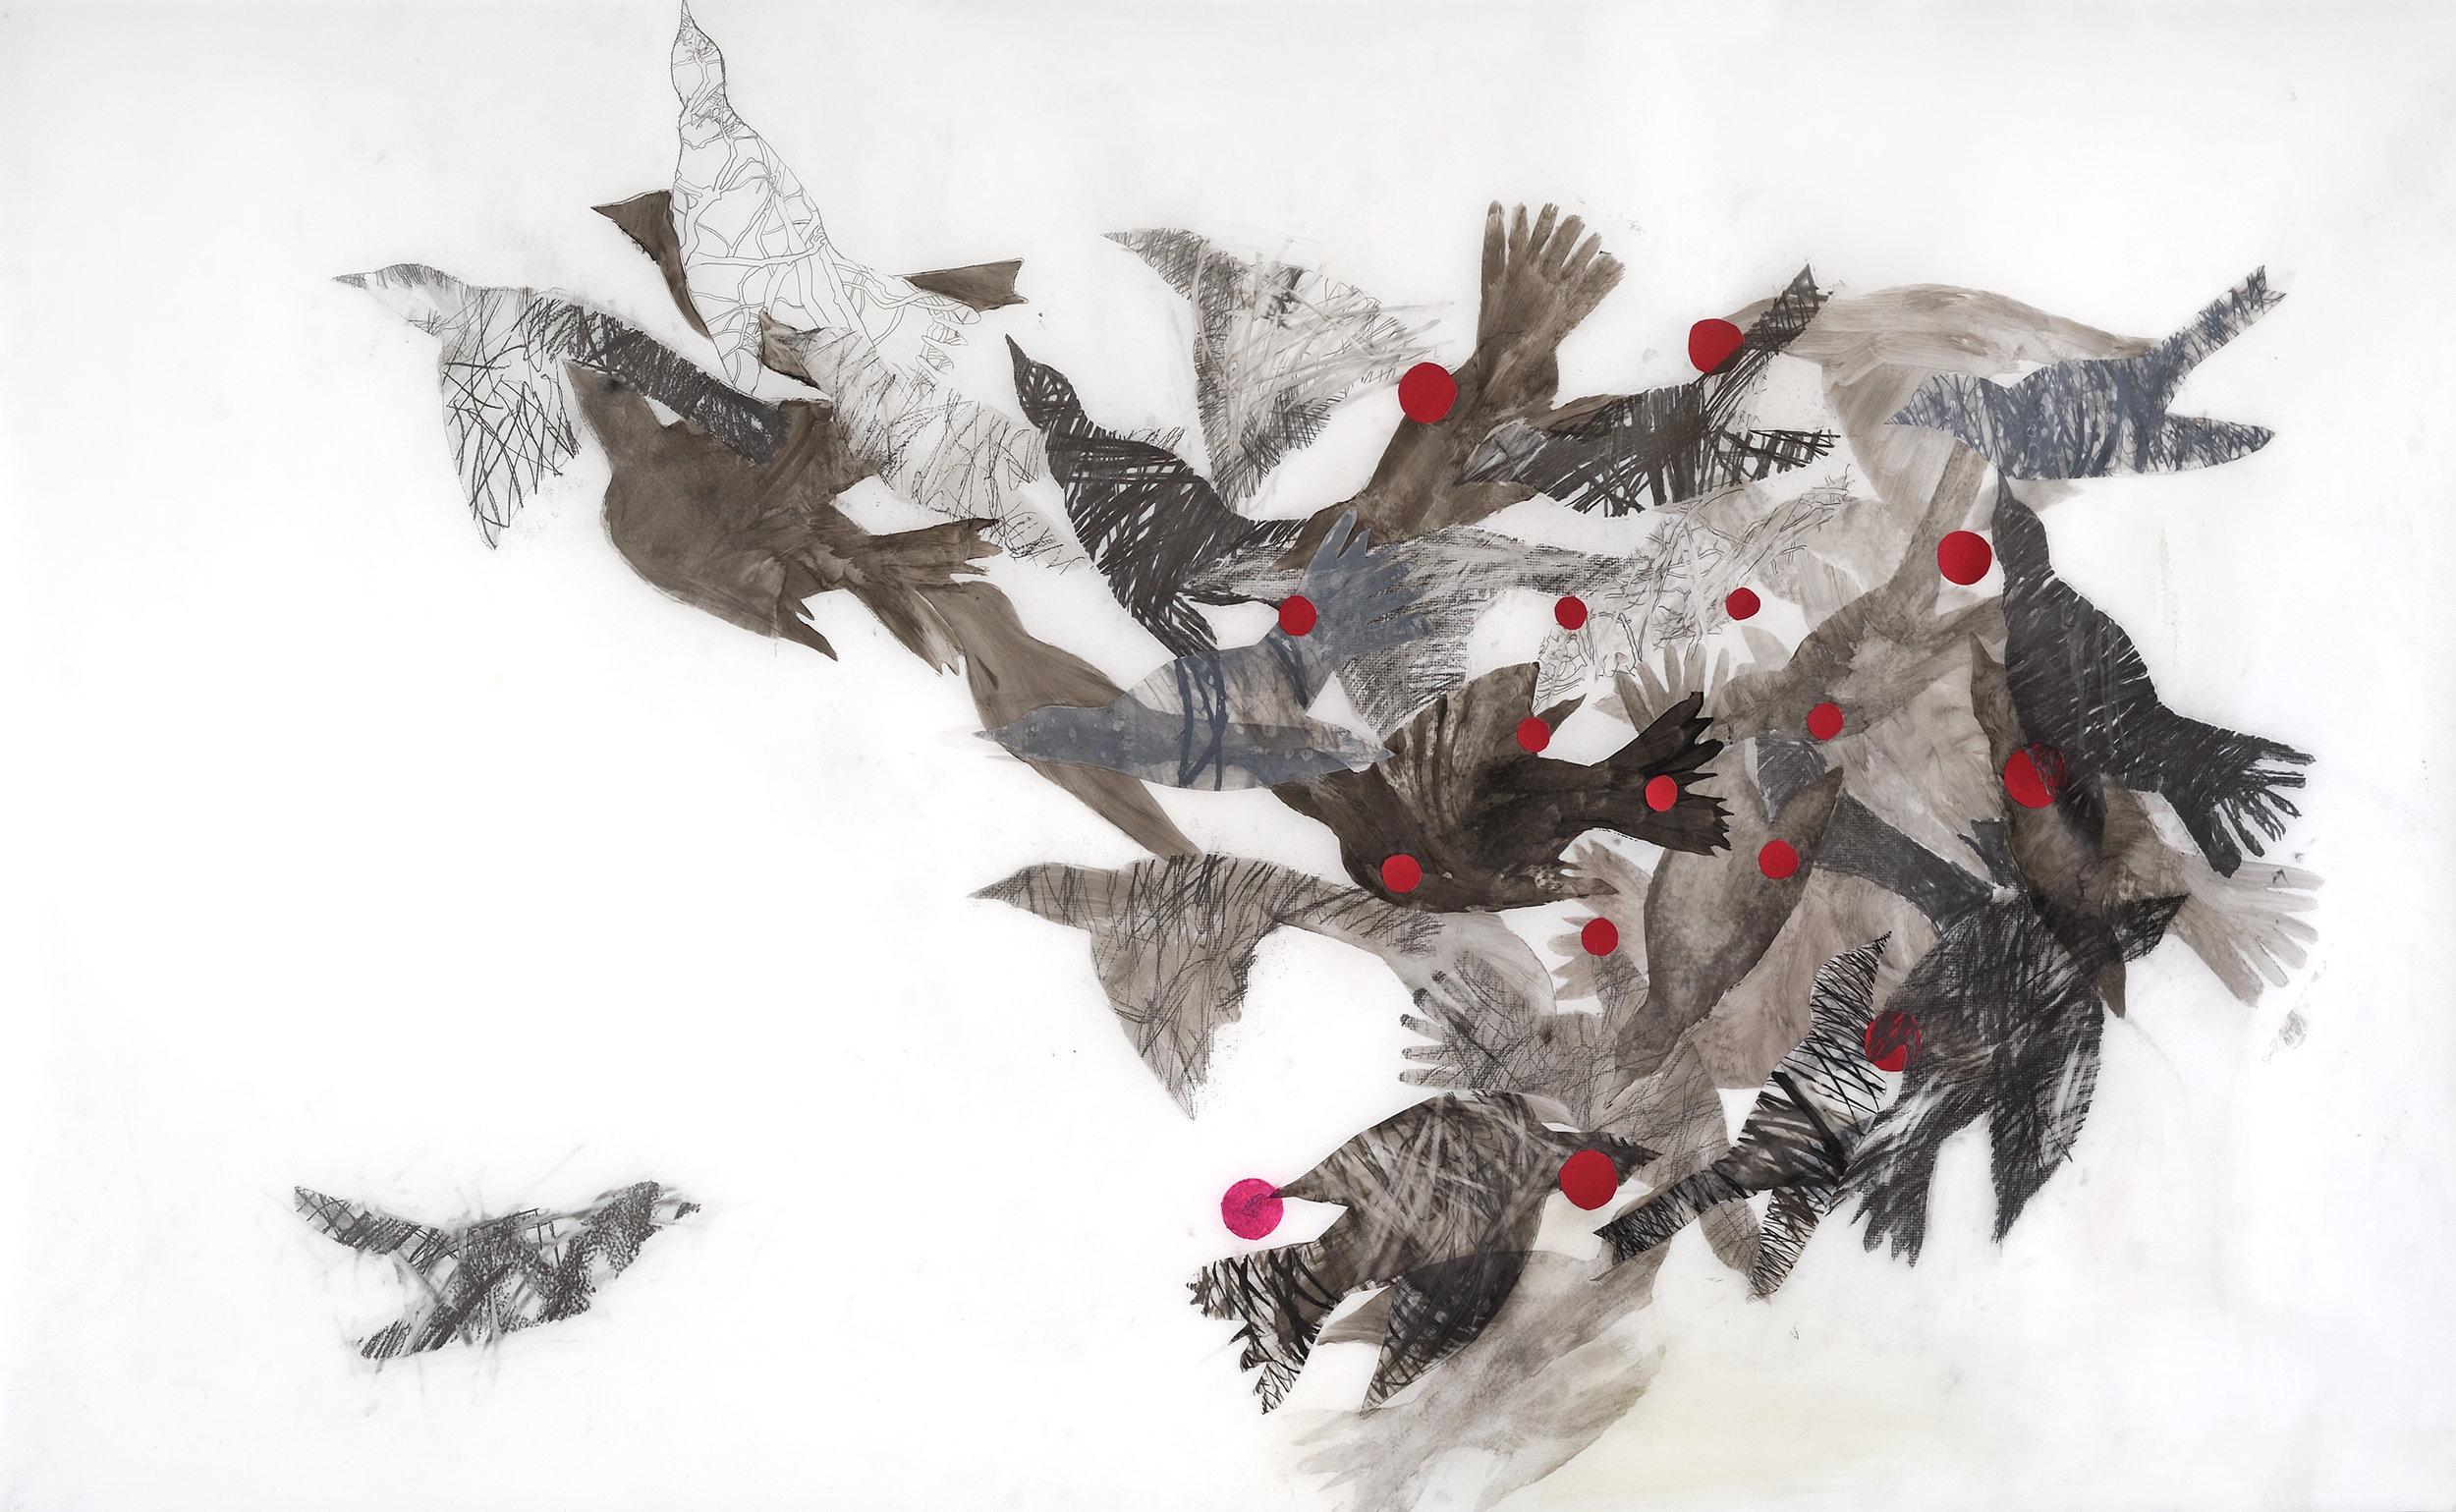 birds in funnel formation.jpg